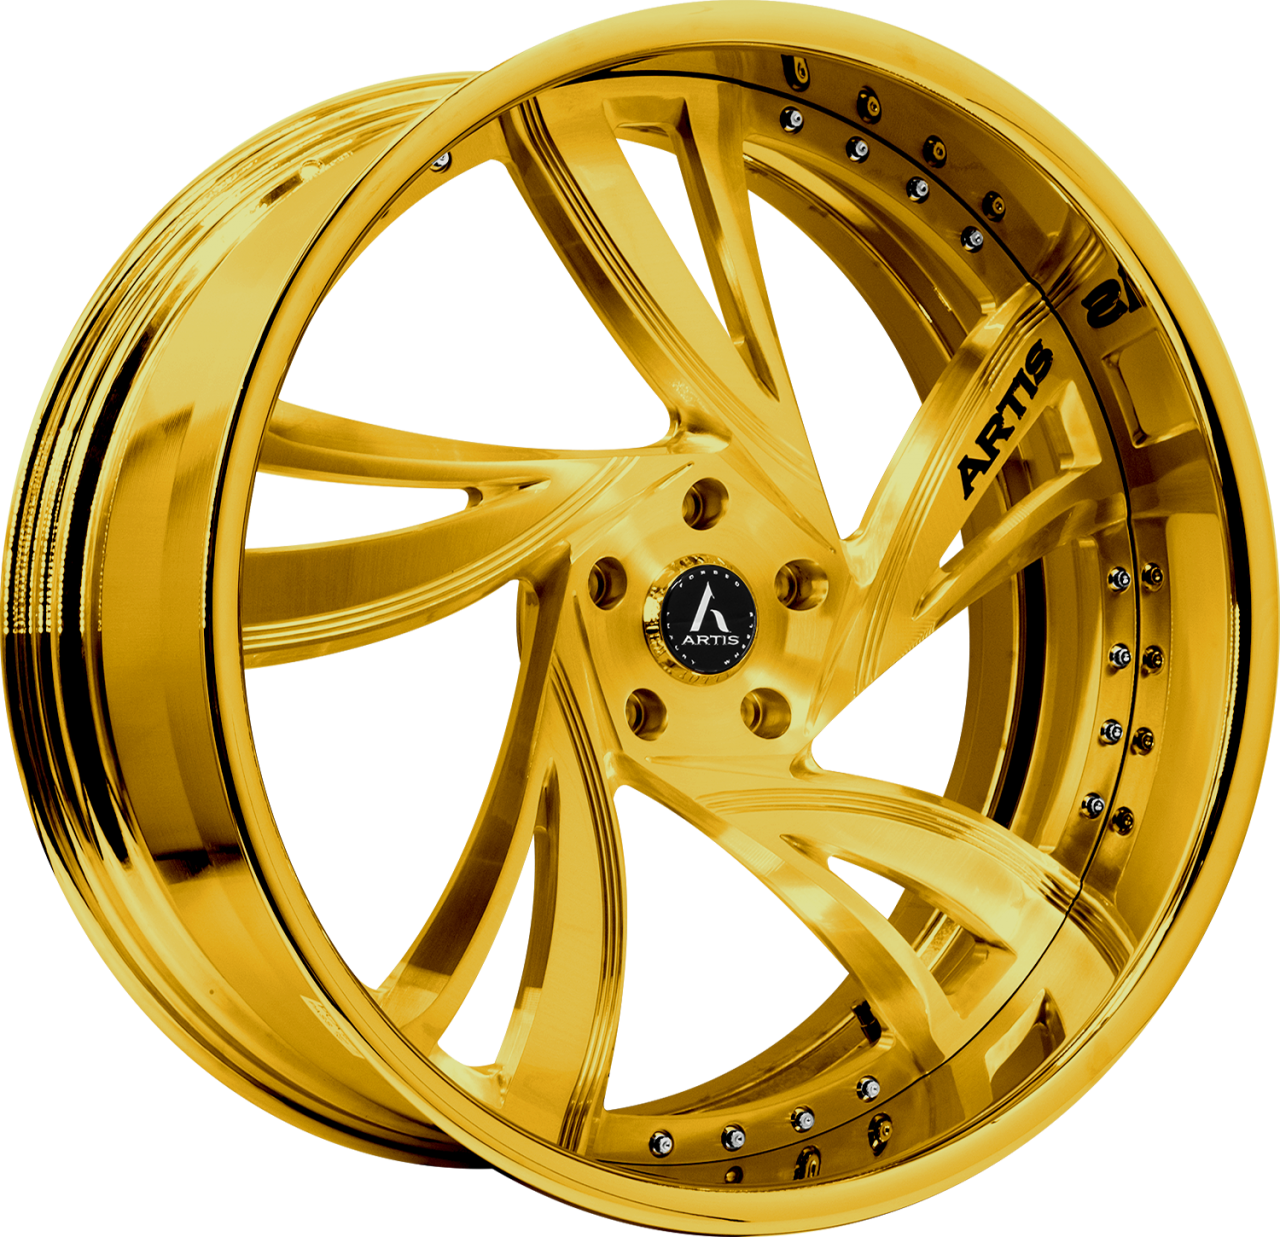 Artis Forged Kingston wheel with Custom Gold finish